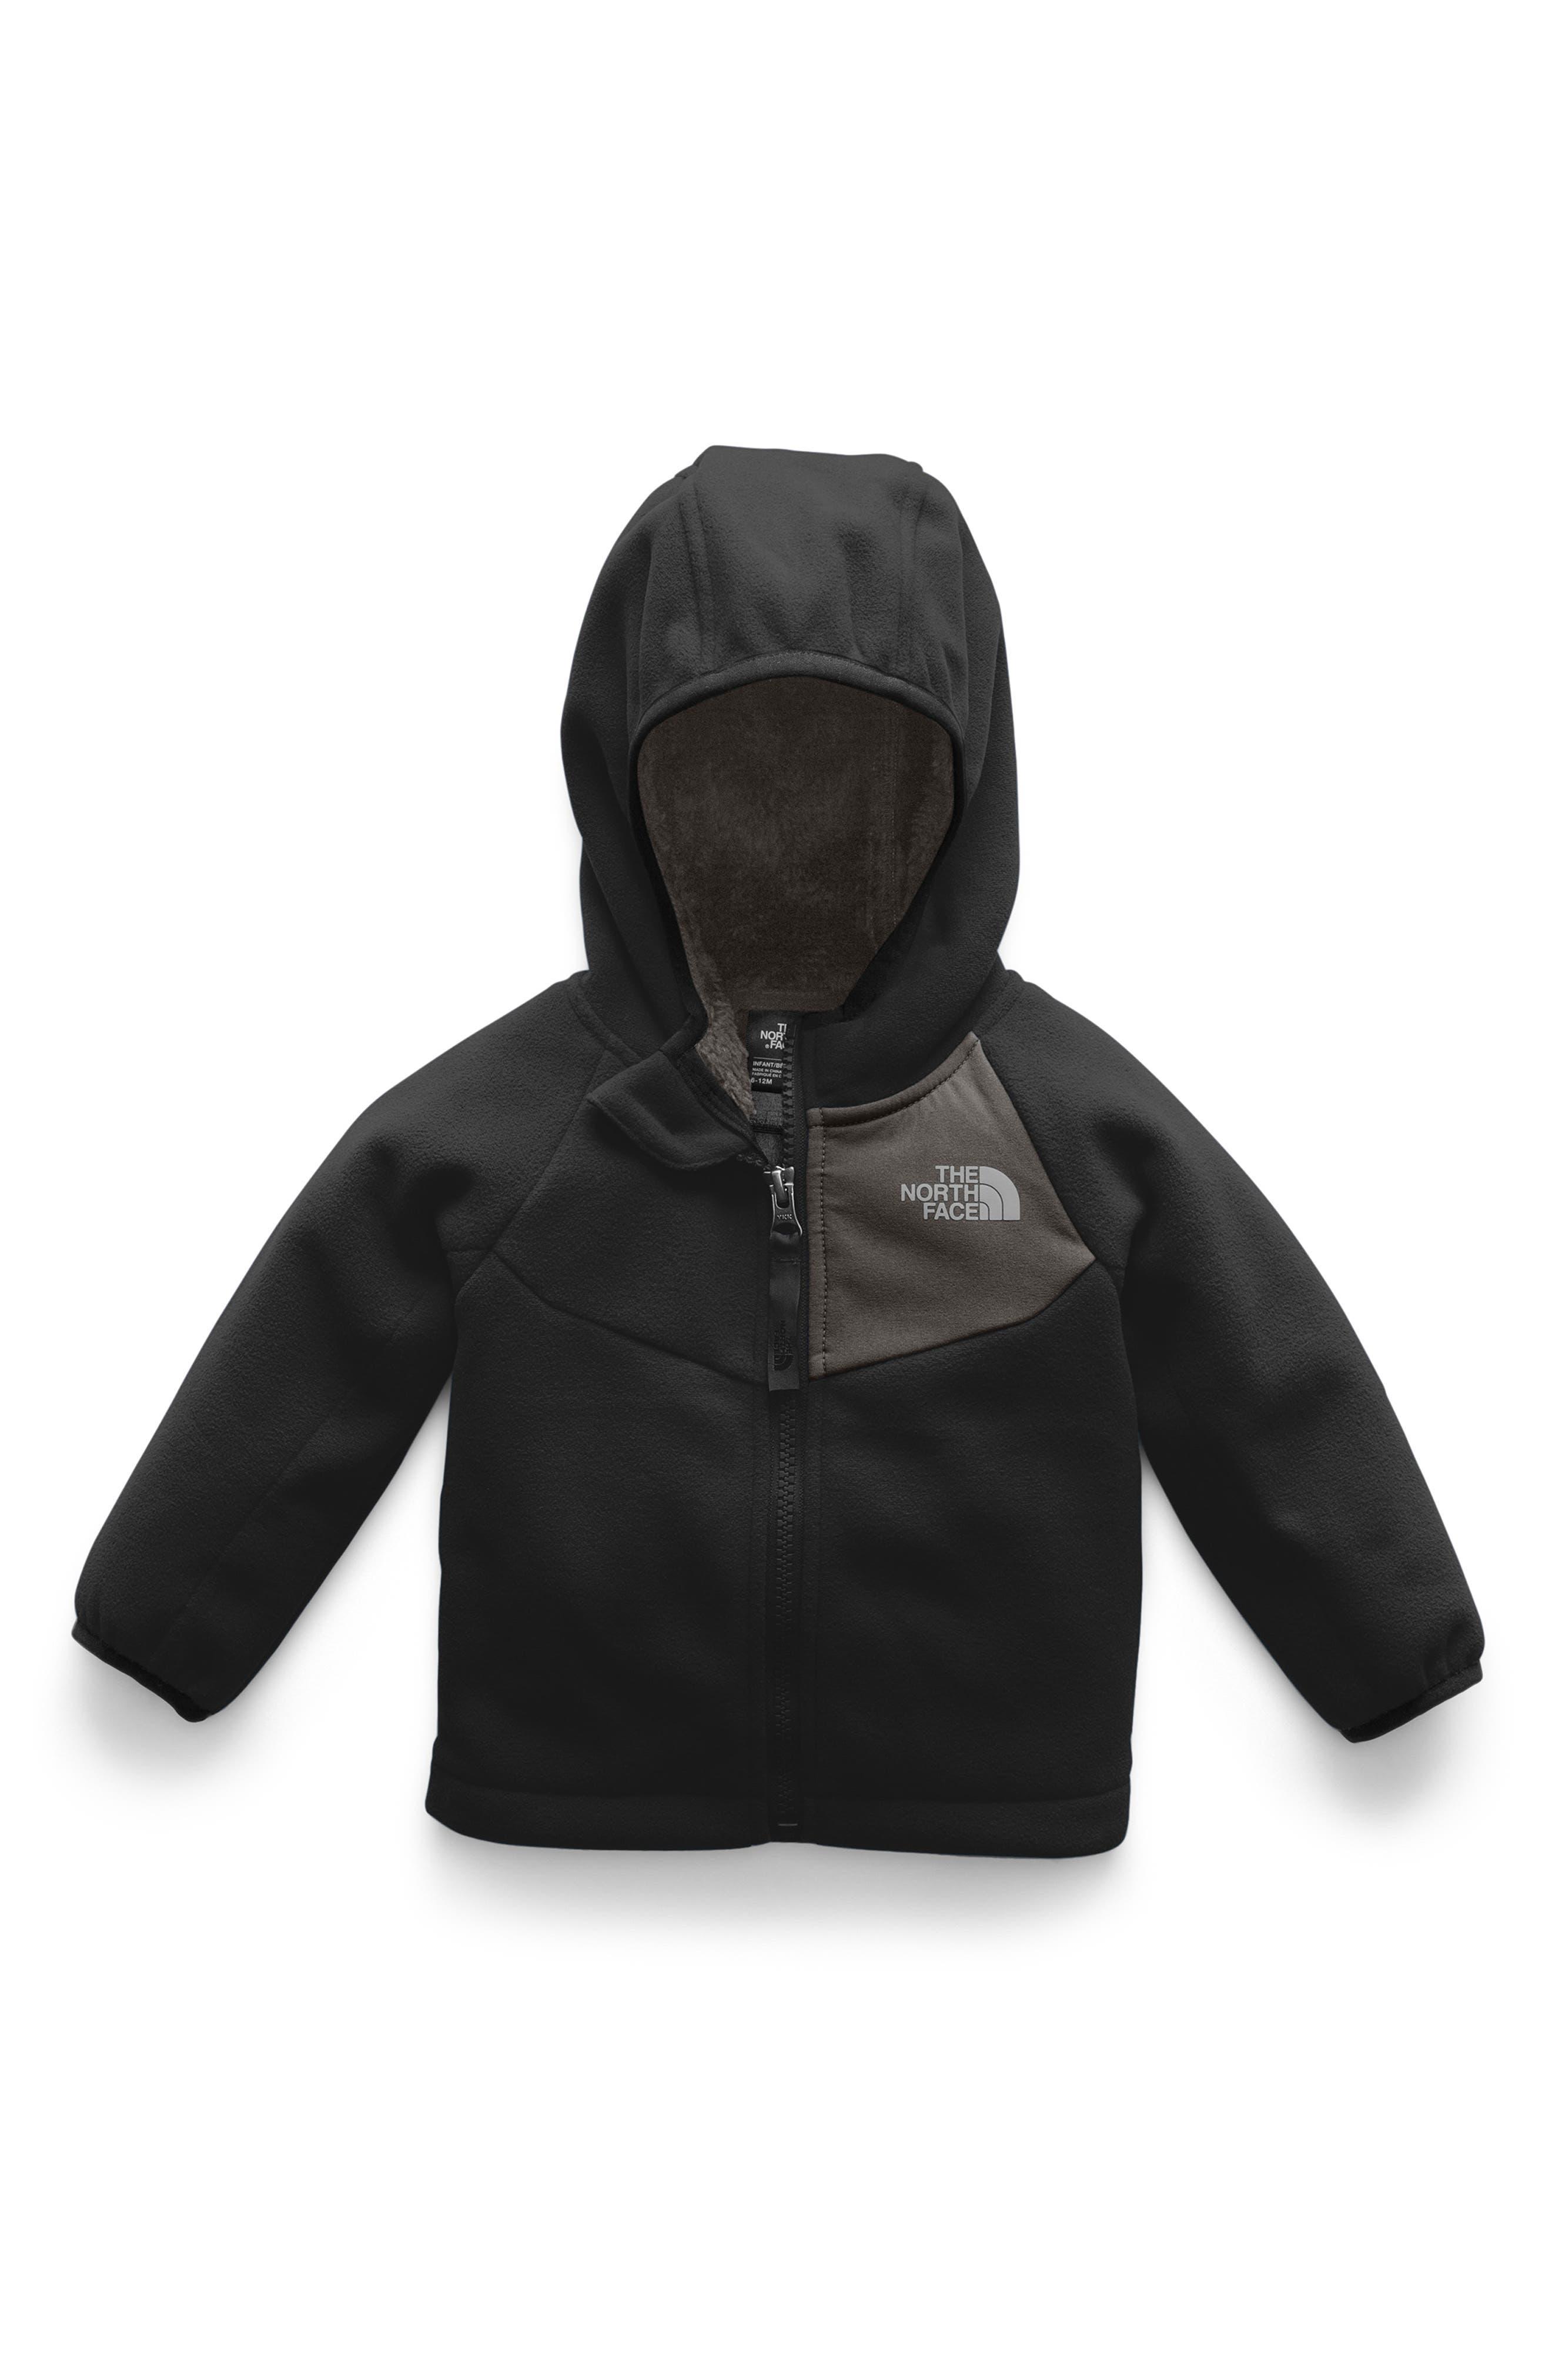 Chimborazo Hooded Jacket,                             Main thumbnail 1, color,                             TNF BLACK/ GRAPHITE GREY